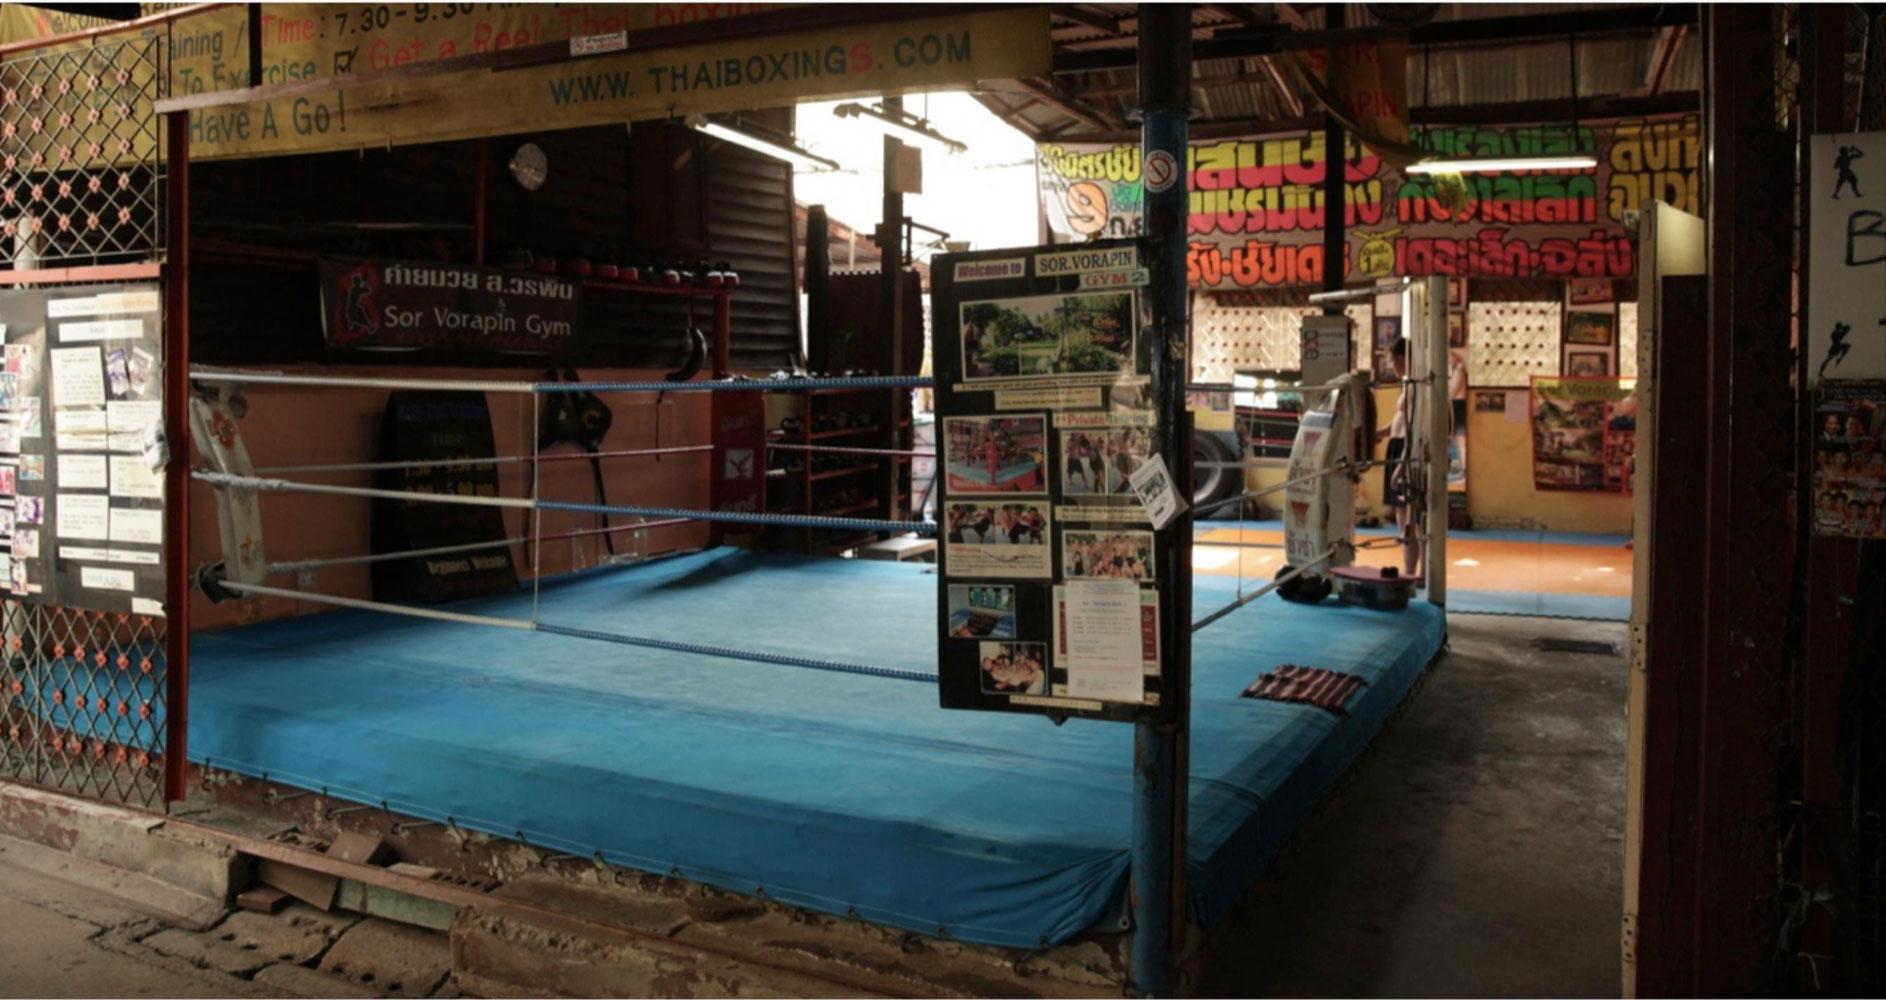 Muay Thai boxing gym filming location in Bangkok Thailand